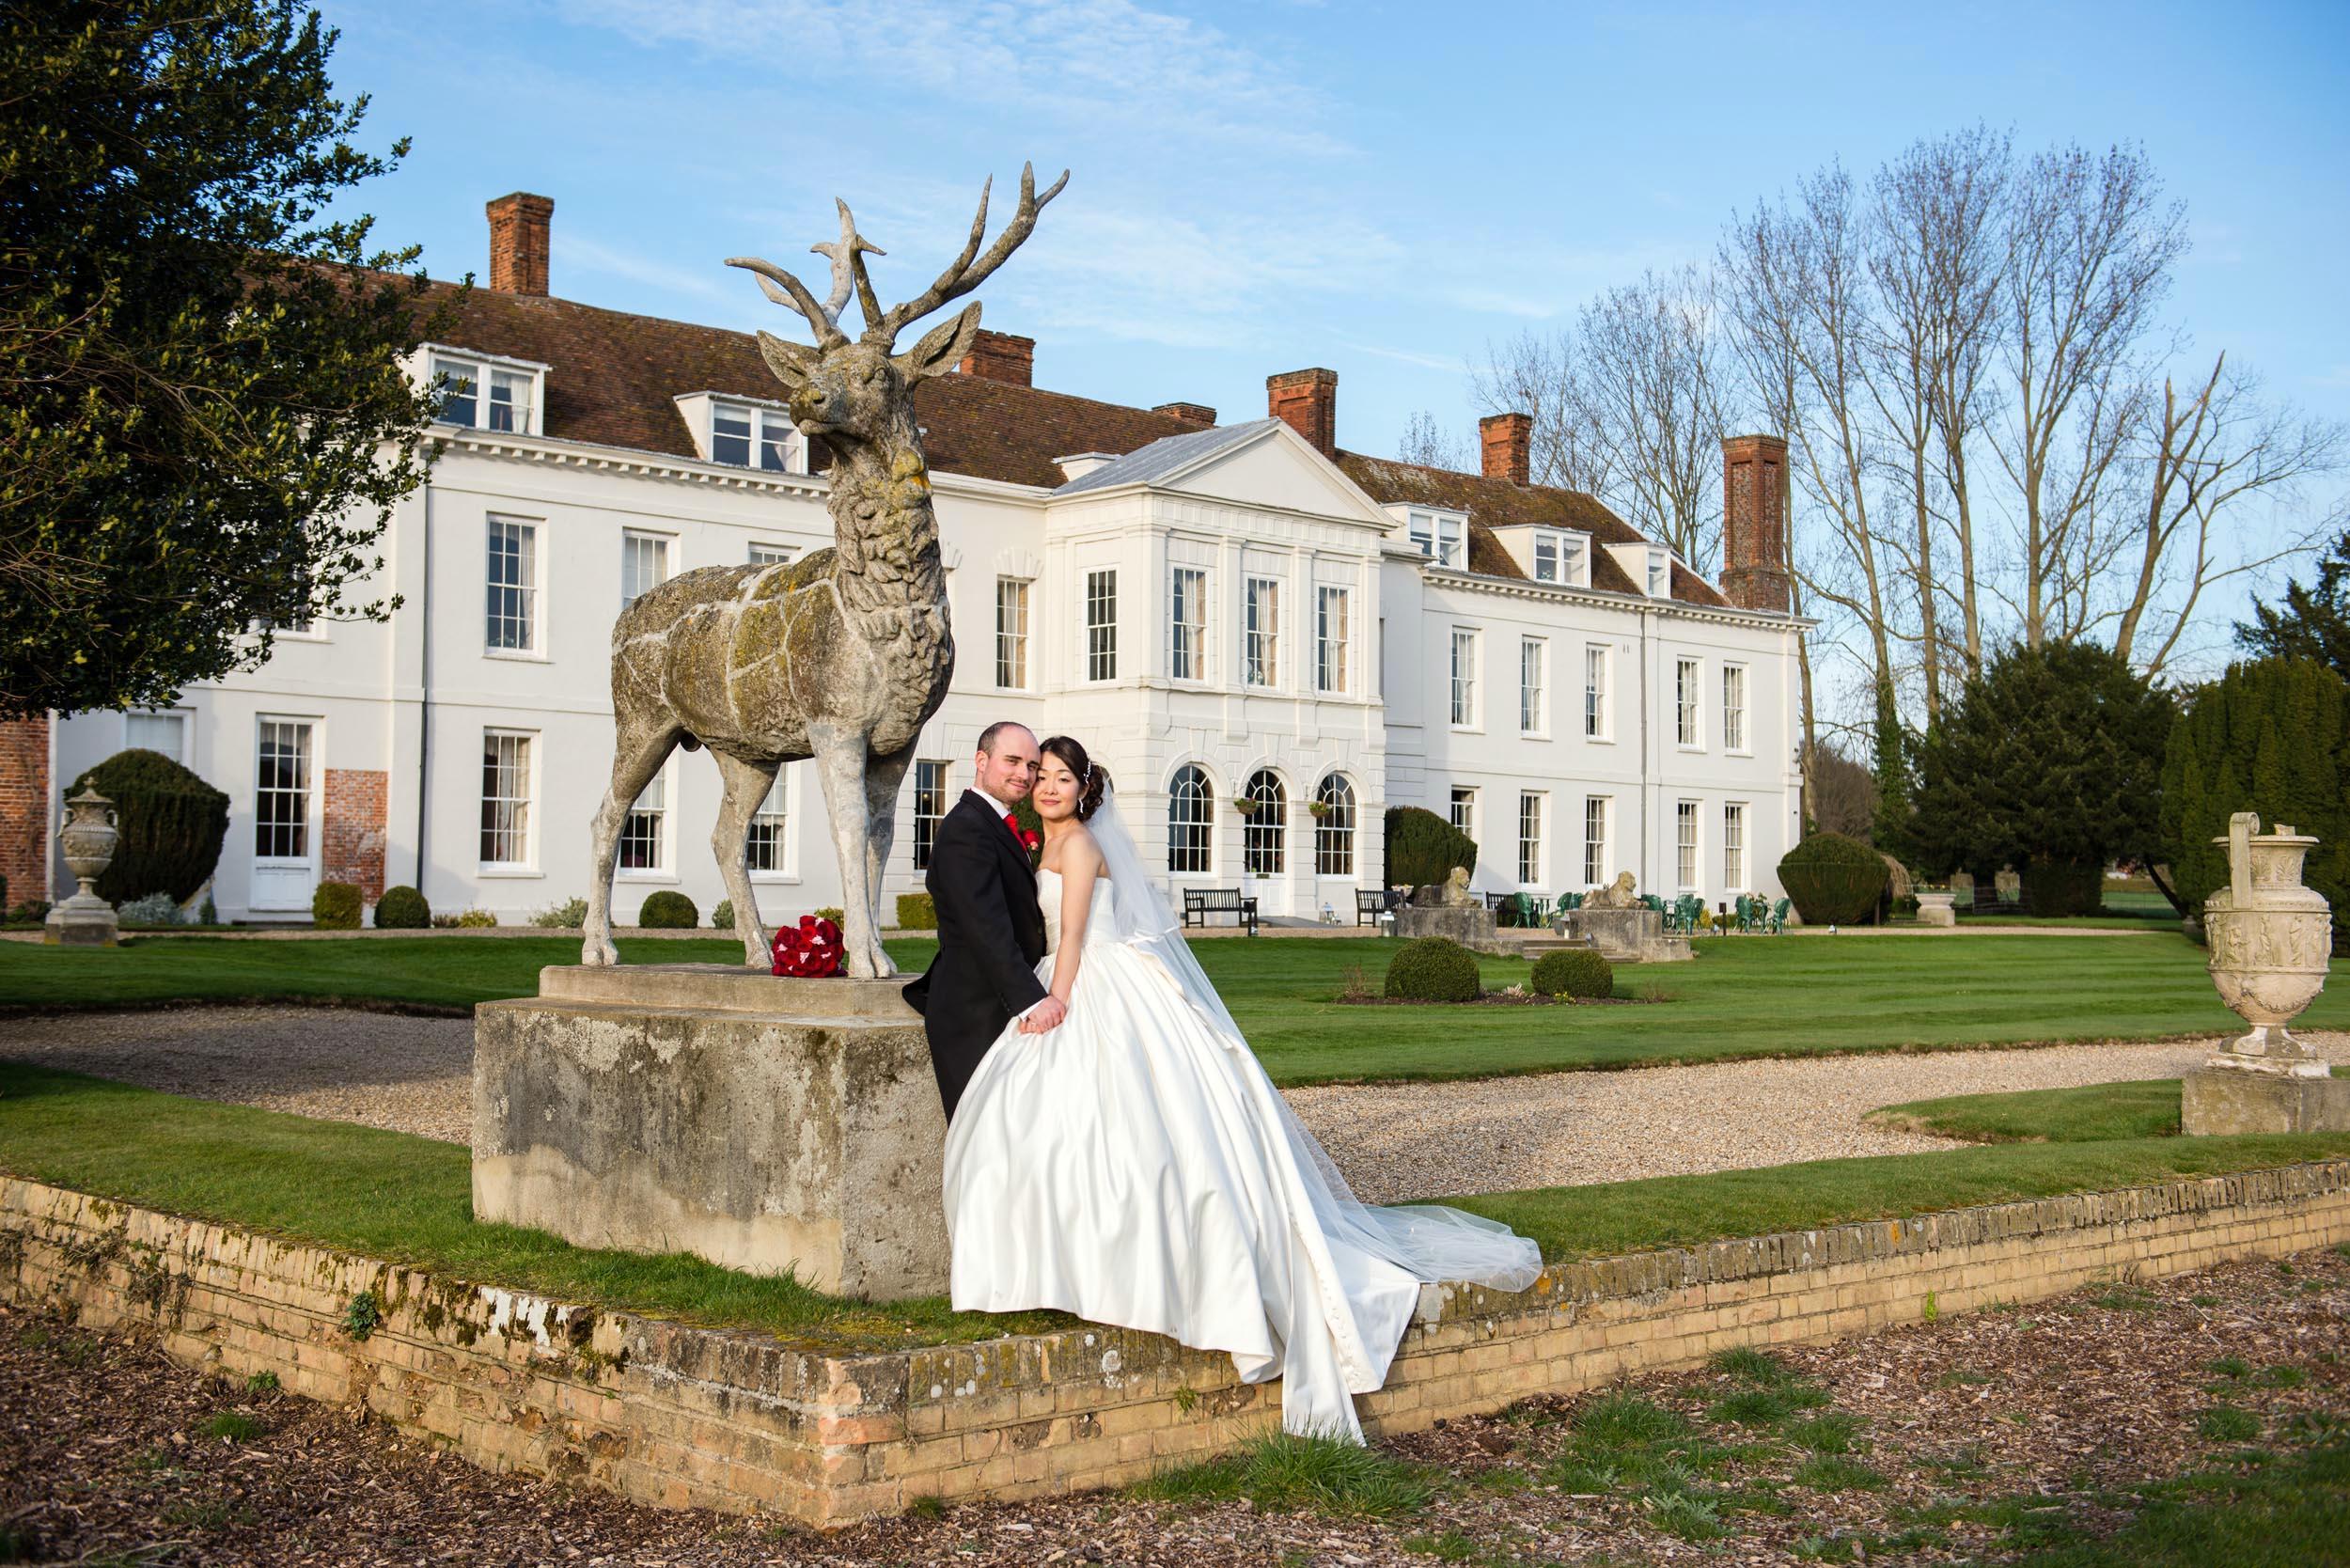 Weddings at Gosfield Hall